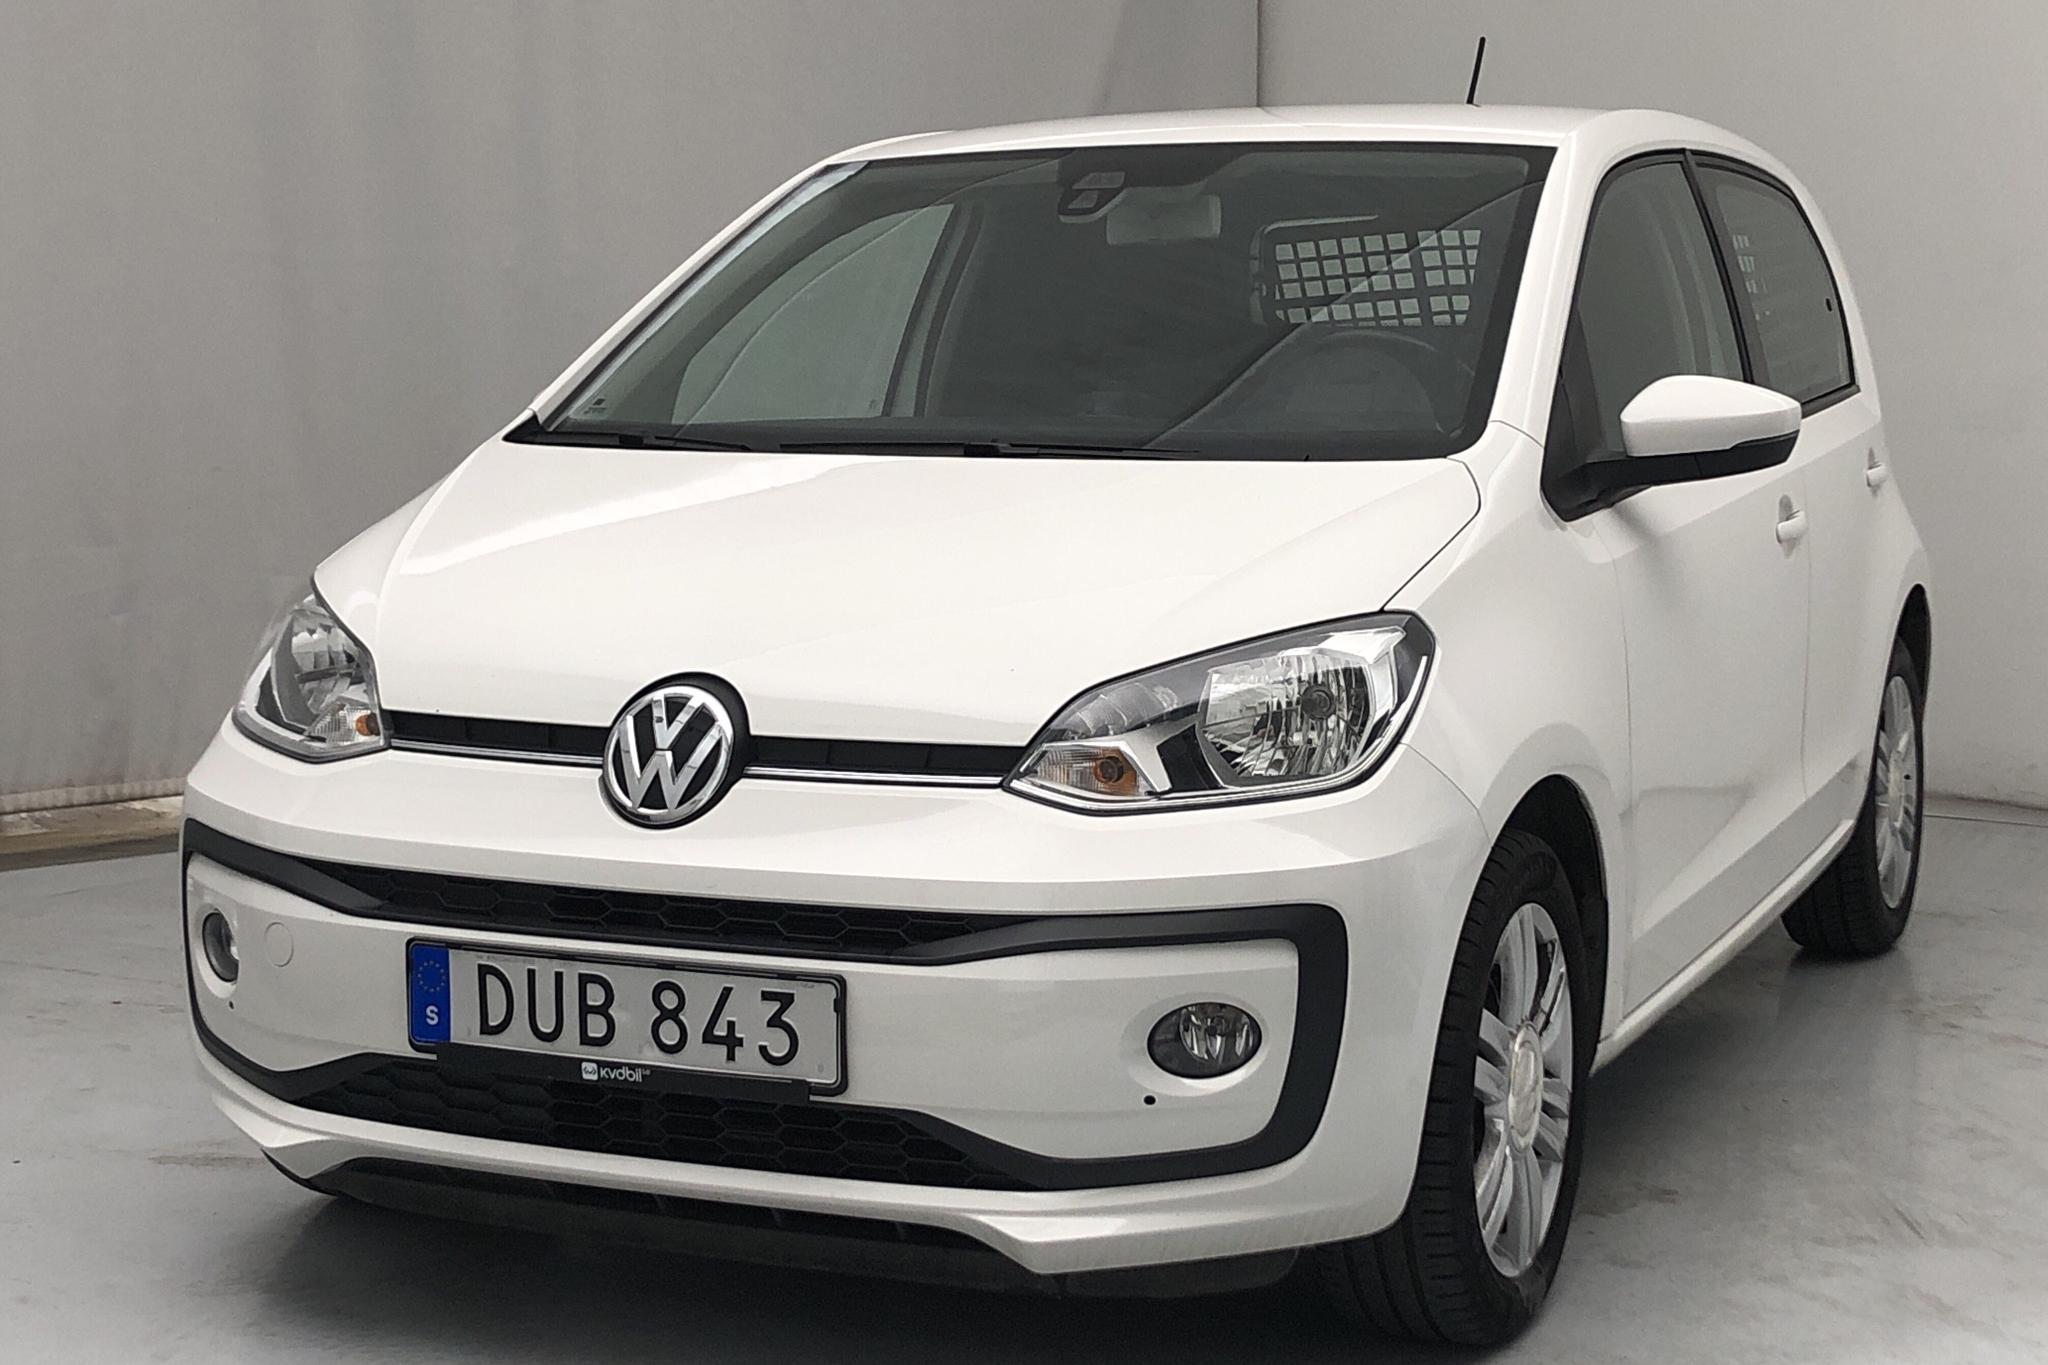 VW up! 1.0 5dr (75hk) - 5 036 mil - Manuell - vit - 2018